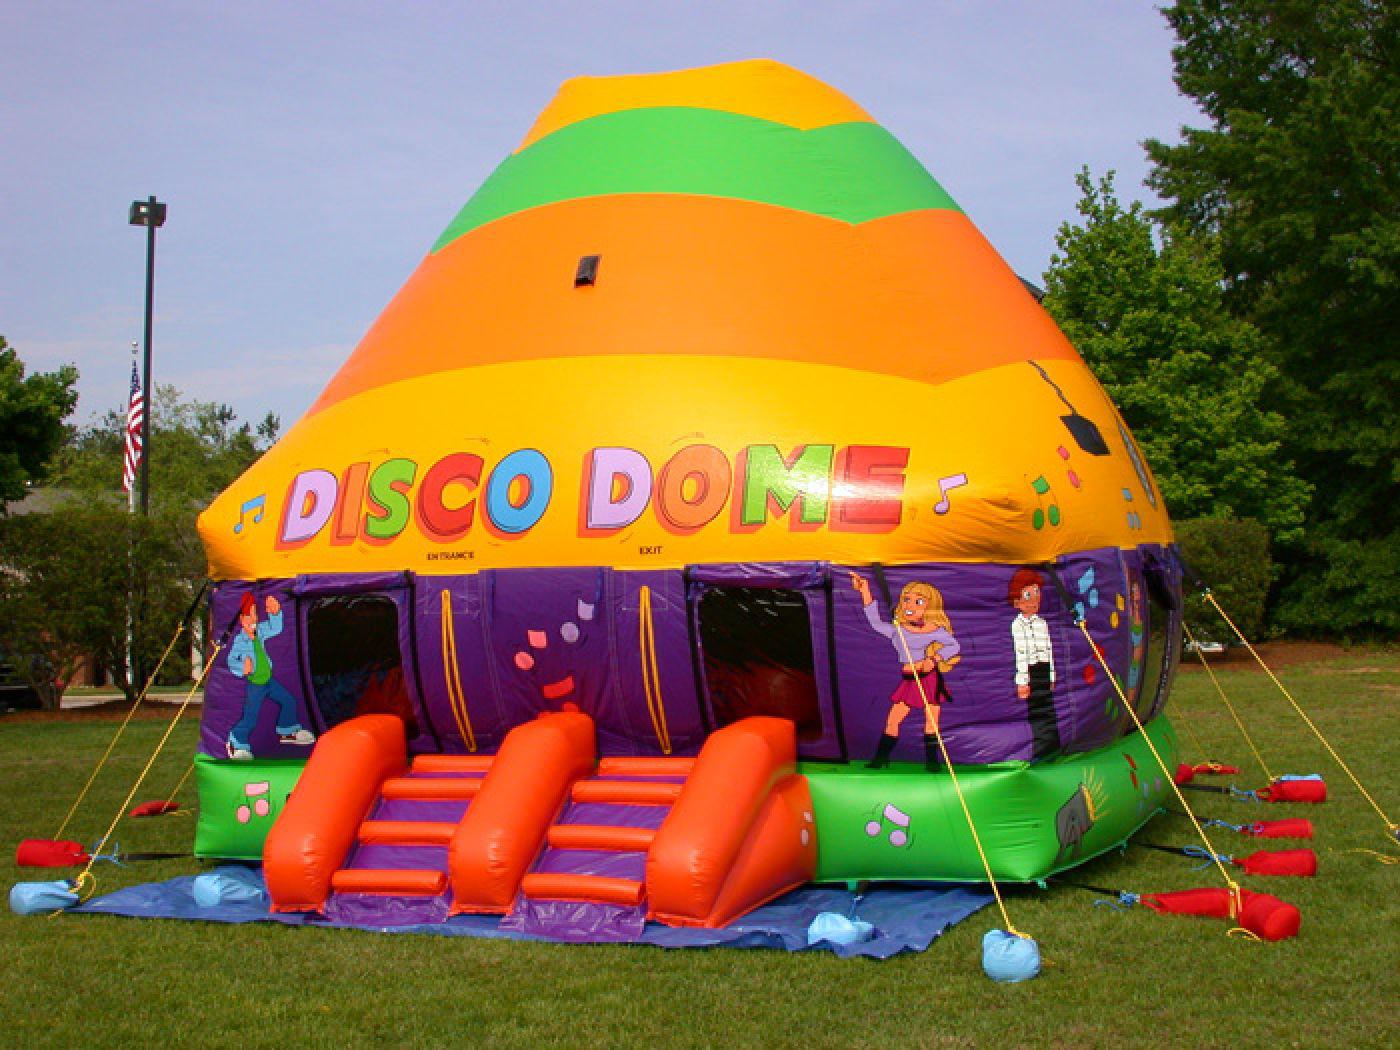 Rainbow Disco Dome Inflatables